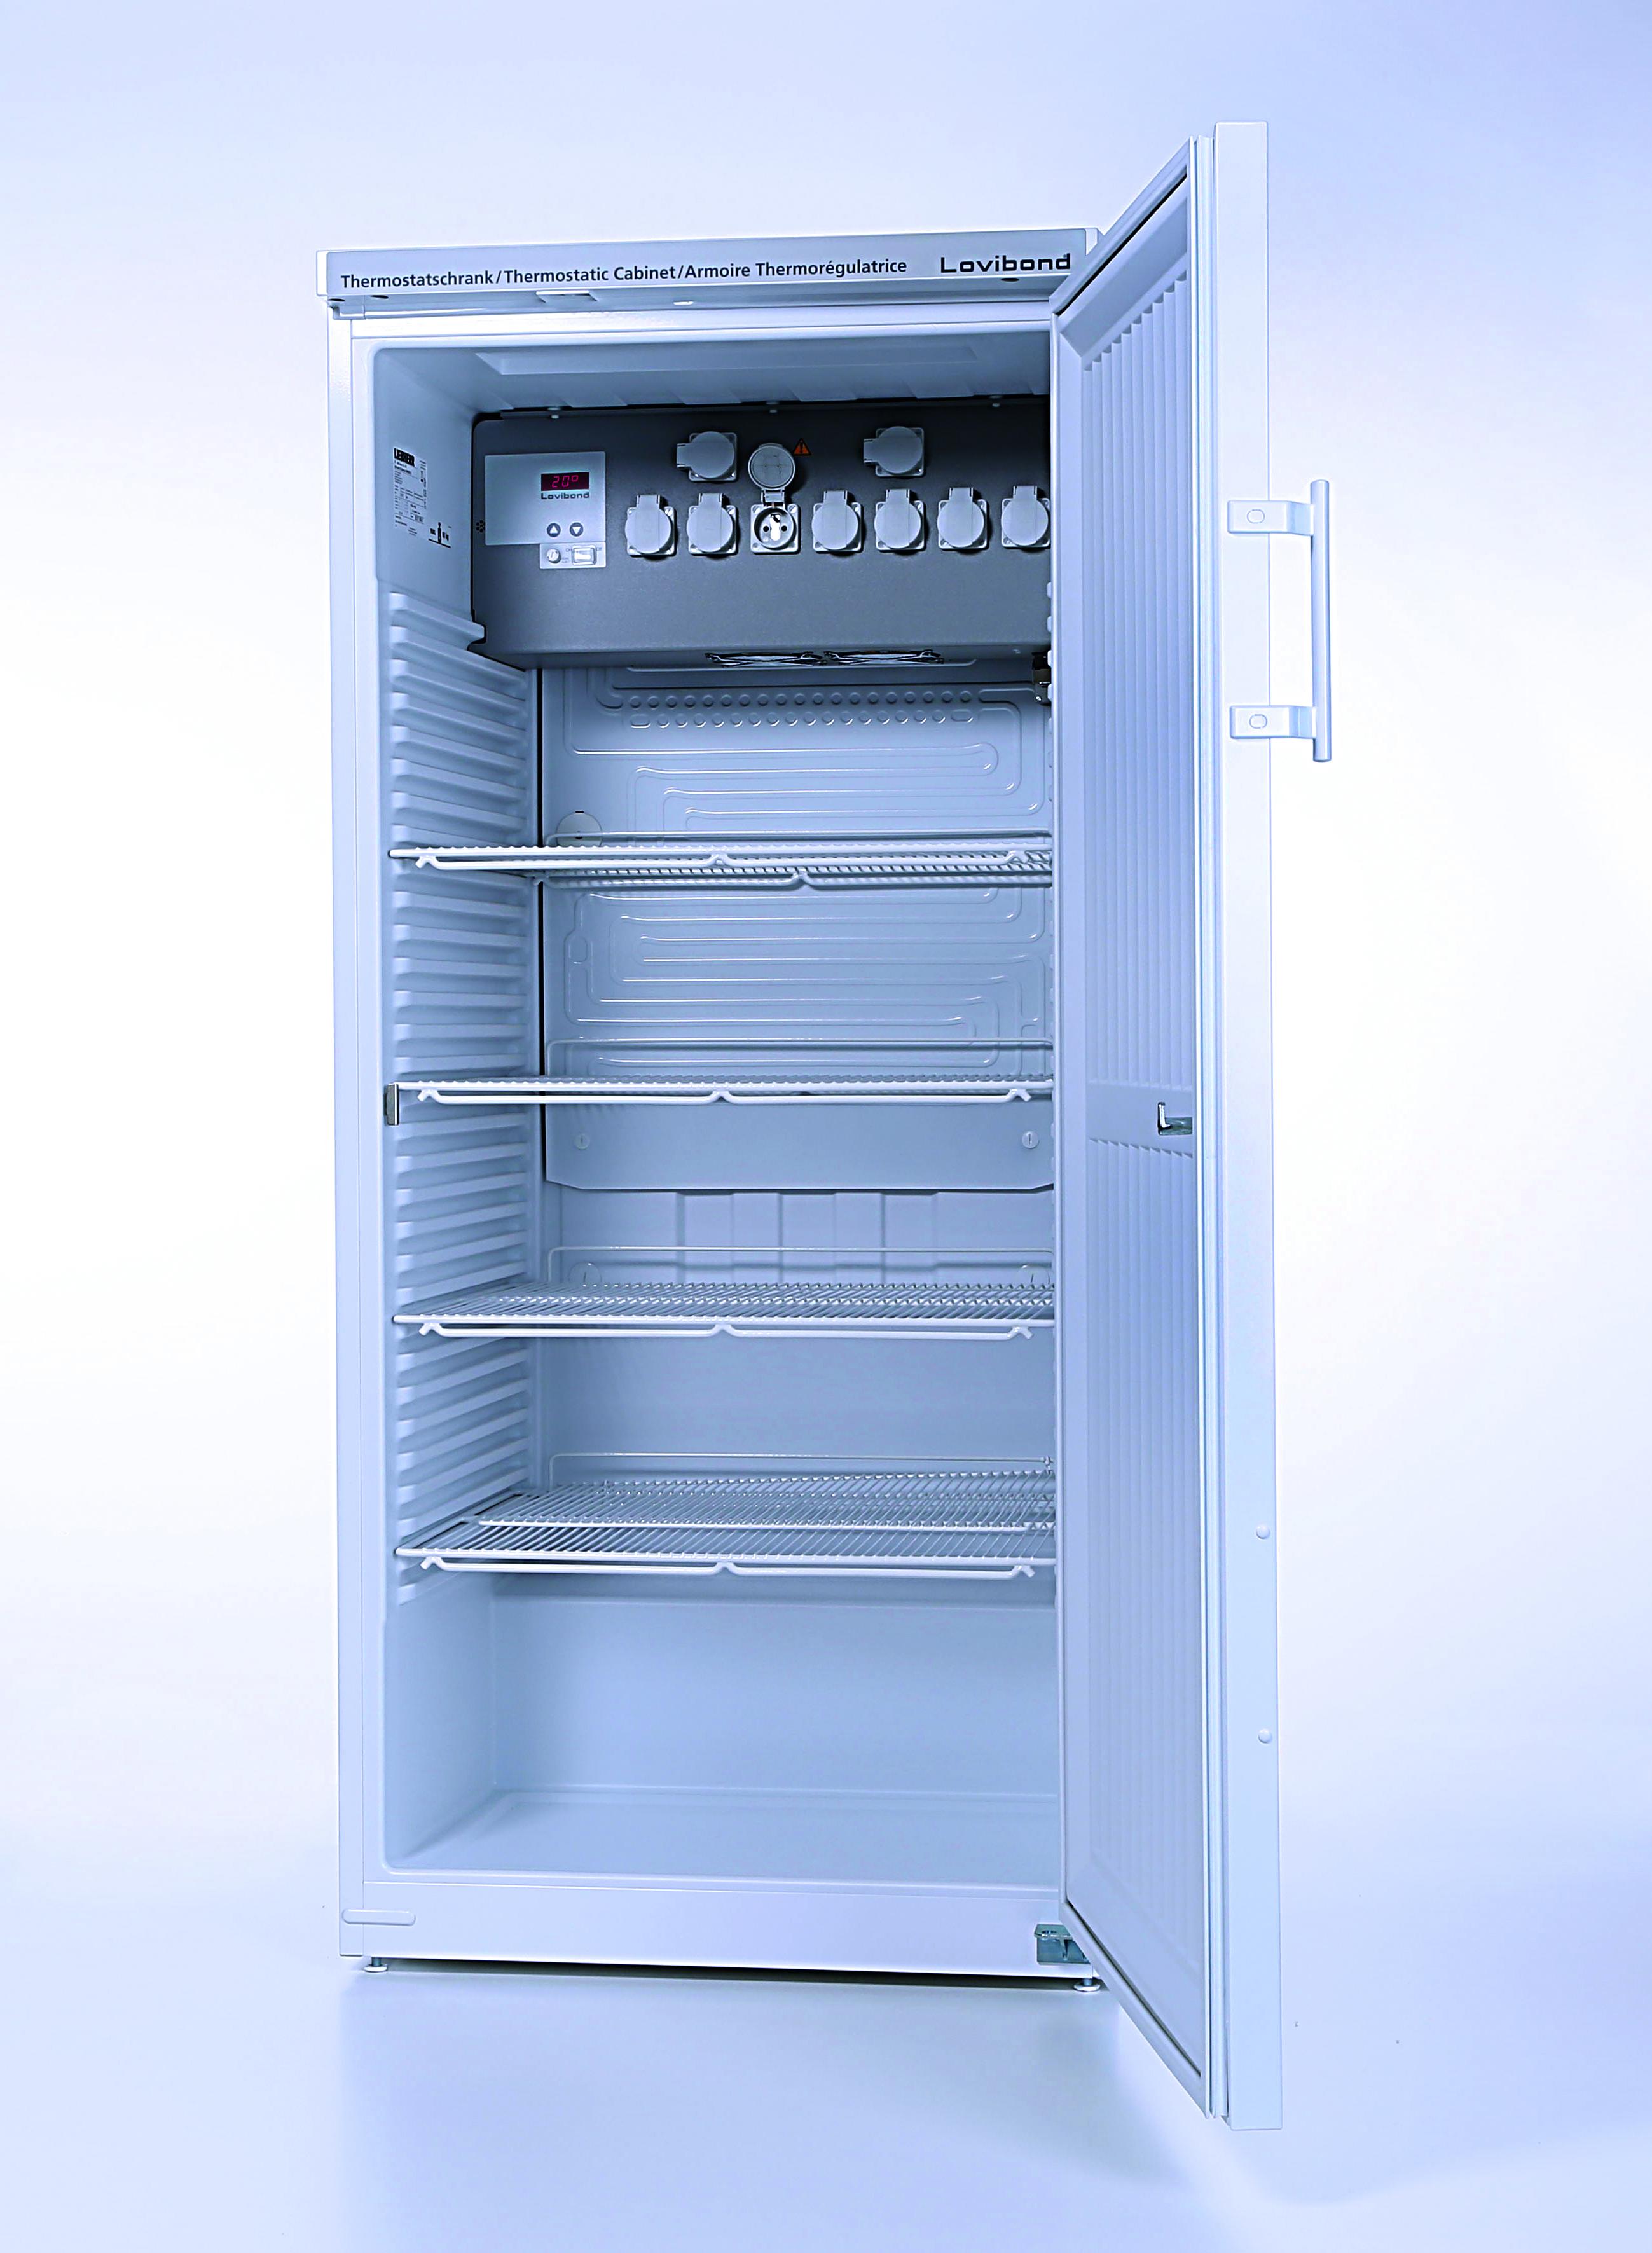 Cabinet Incubator Kit Incubator Tintometer Home Of The Lovibond Brand